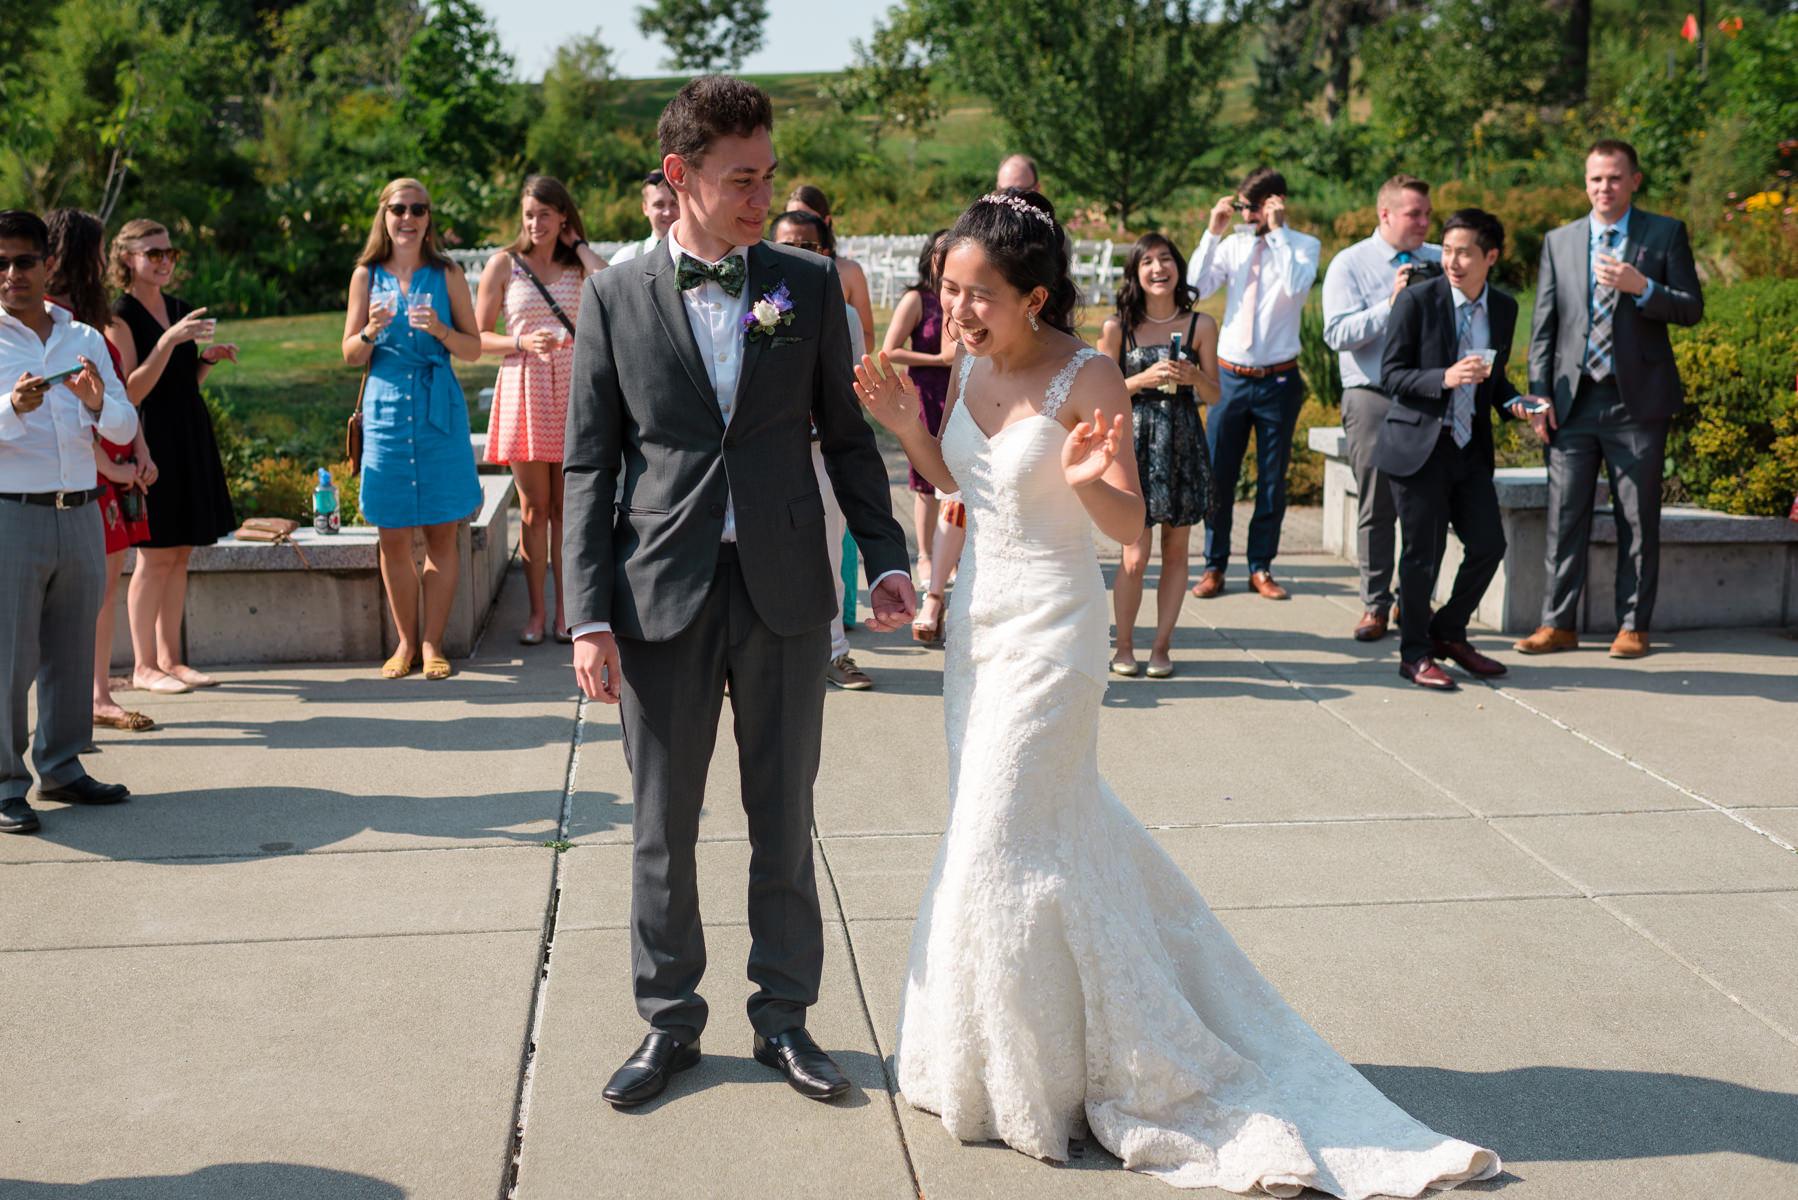 Andrew Tat - Documentary Wedding Photography - Heritage Hall - Kirkland, Washington - Grace & James - 63.JPG